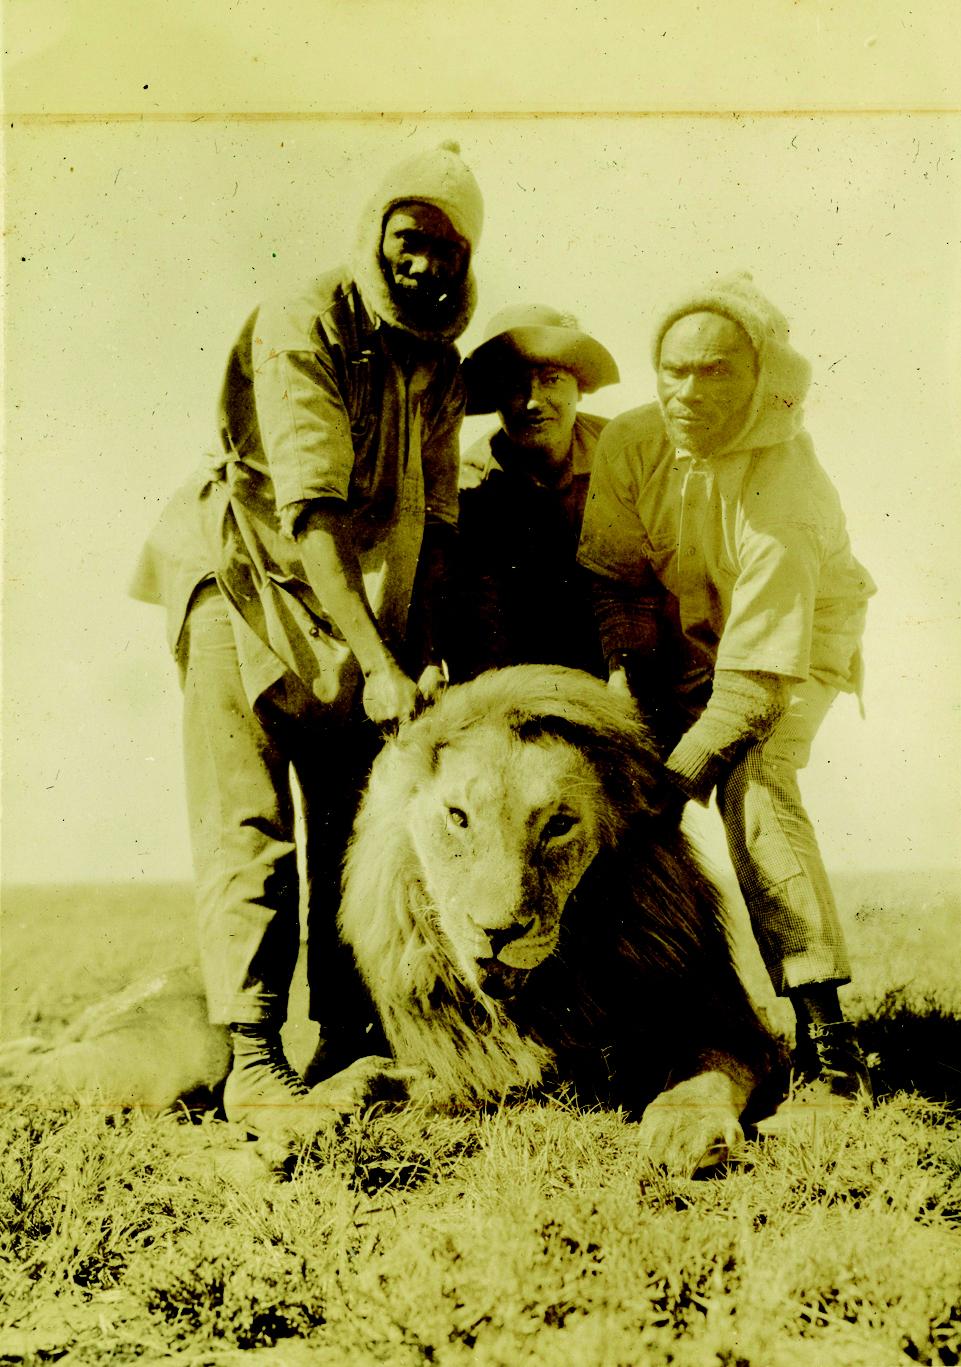 Gertie (center) on her first safari in Kenya in 1927